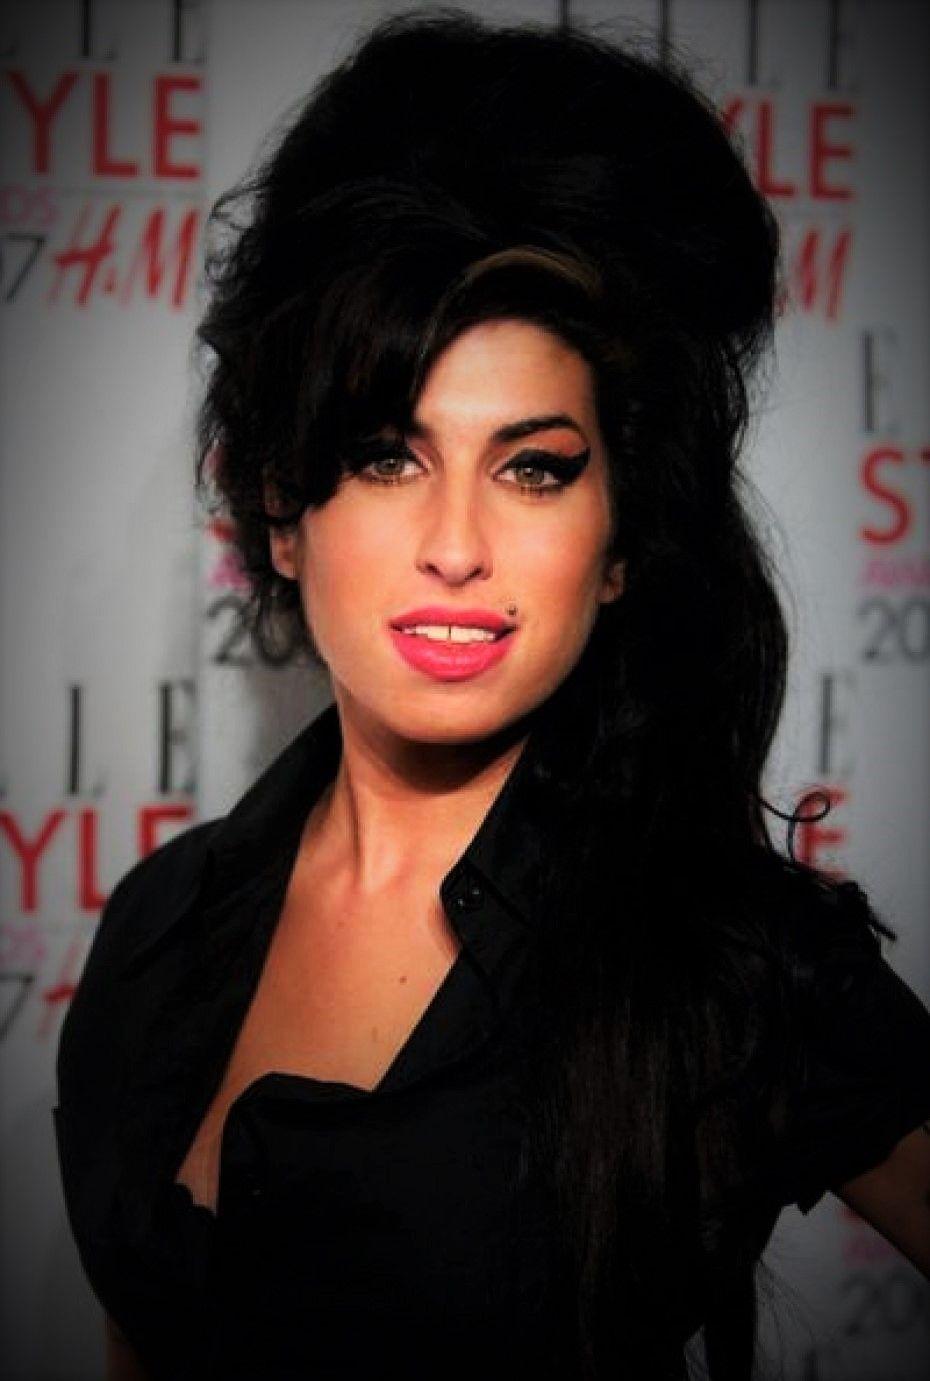 Trend Wie Man Amy Winehouse Frisur Bekommt Neue Frisuren 2018 Best